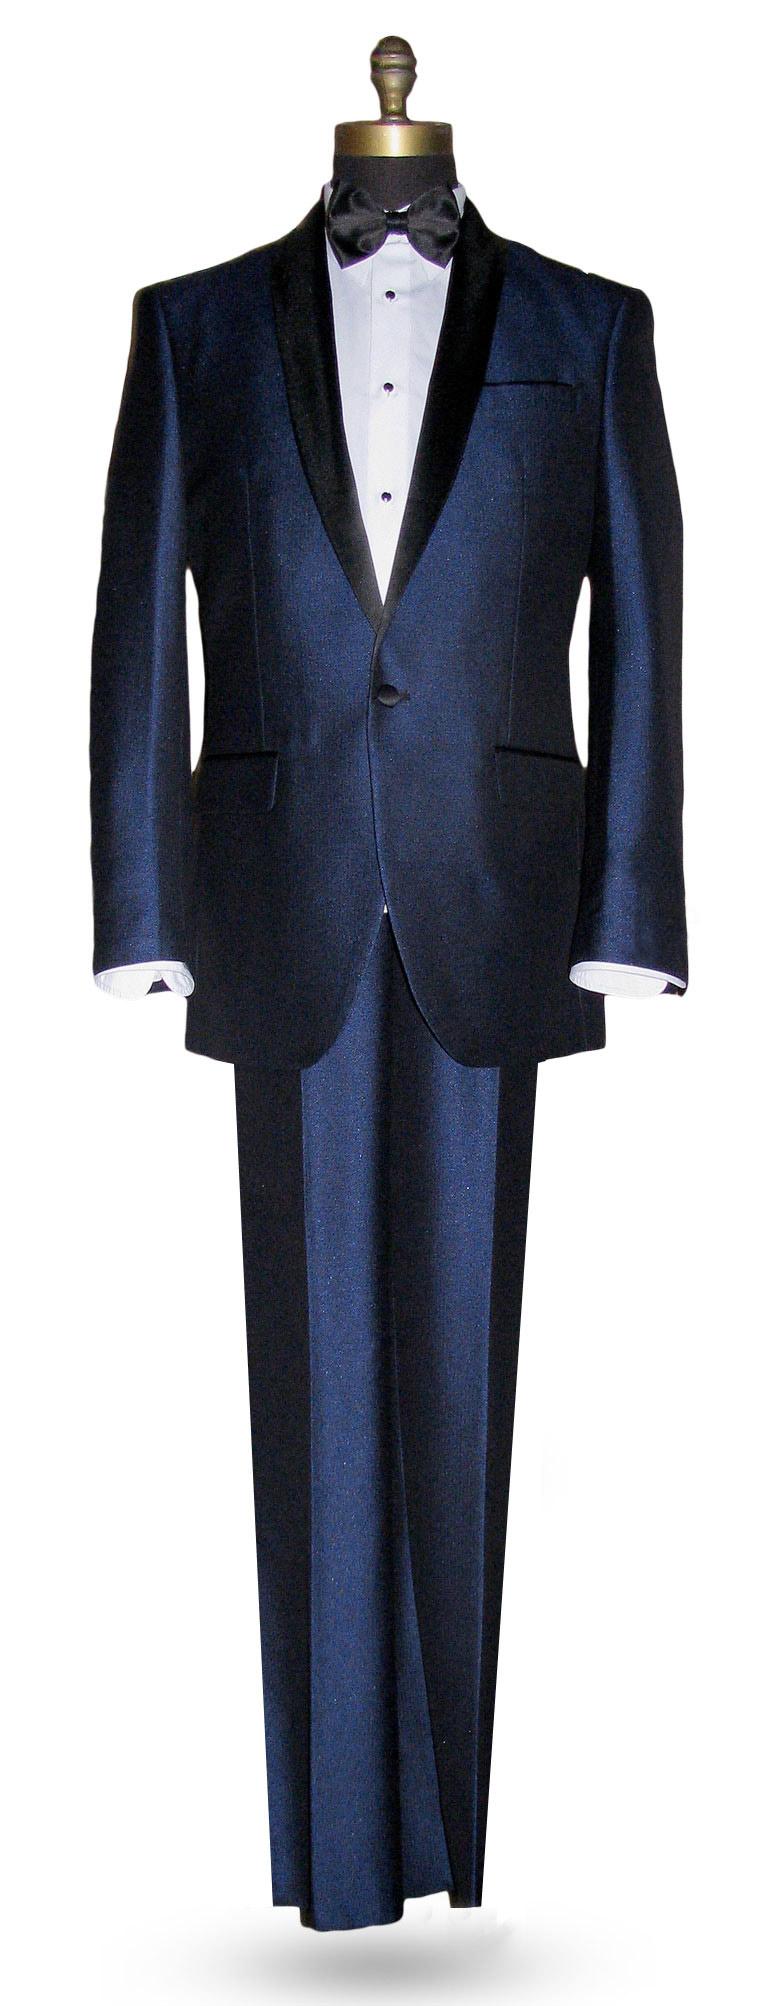 Ink Blue Shawl Collar Tuxedo - Coat, and Vest